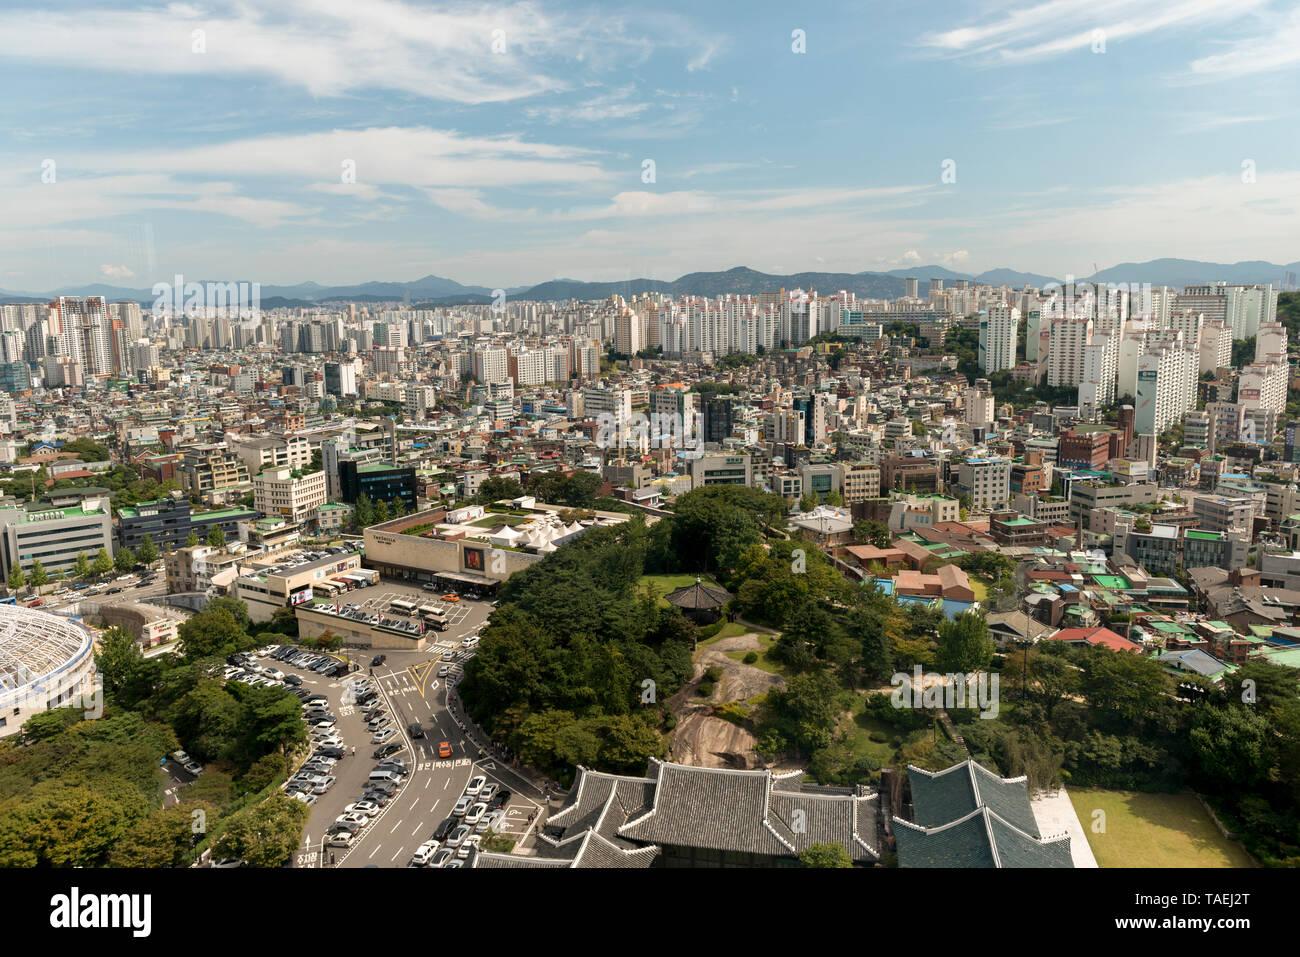 City view from Shilla Hotel, Seoul, South Korea Stock Photo